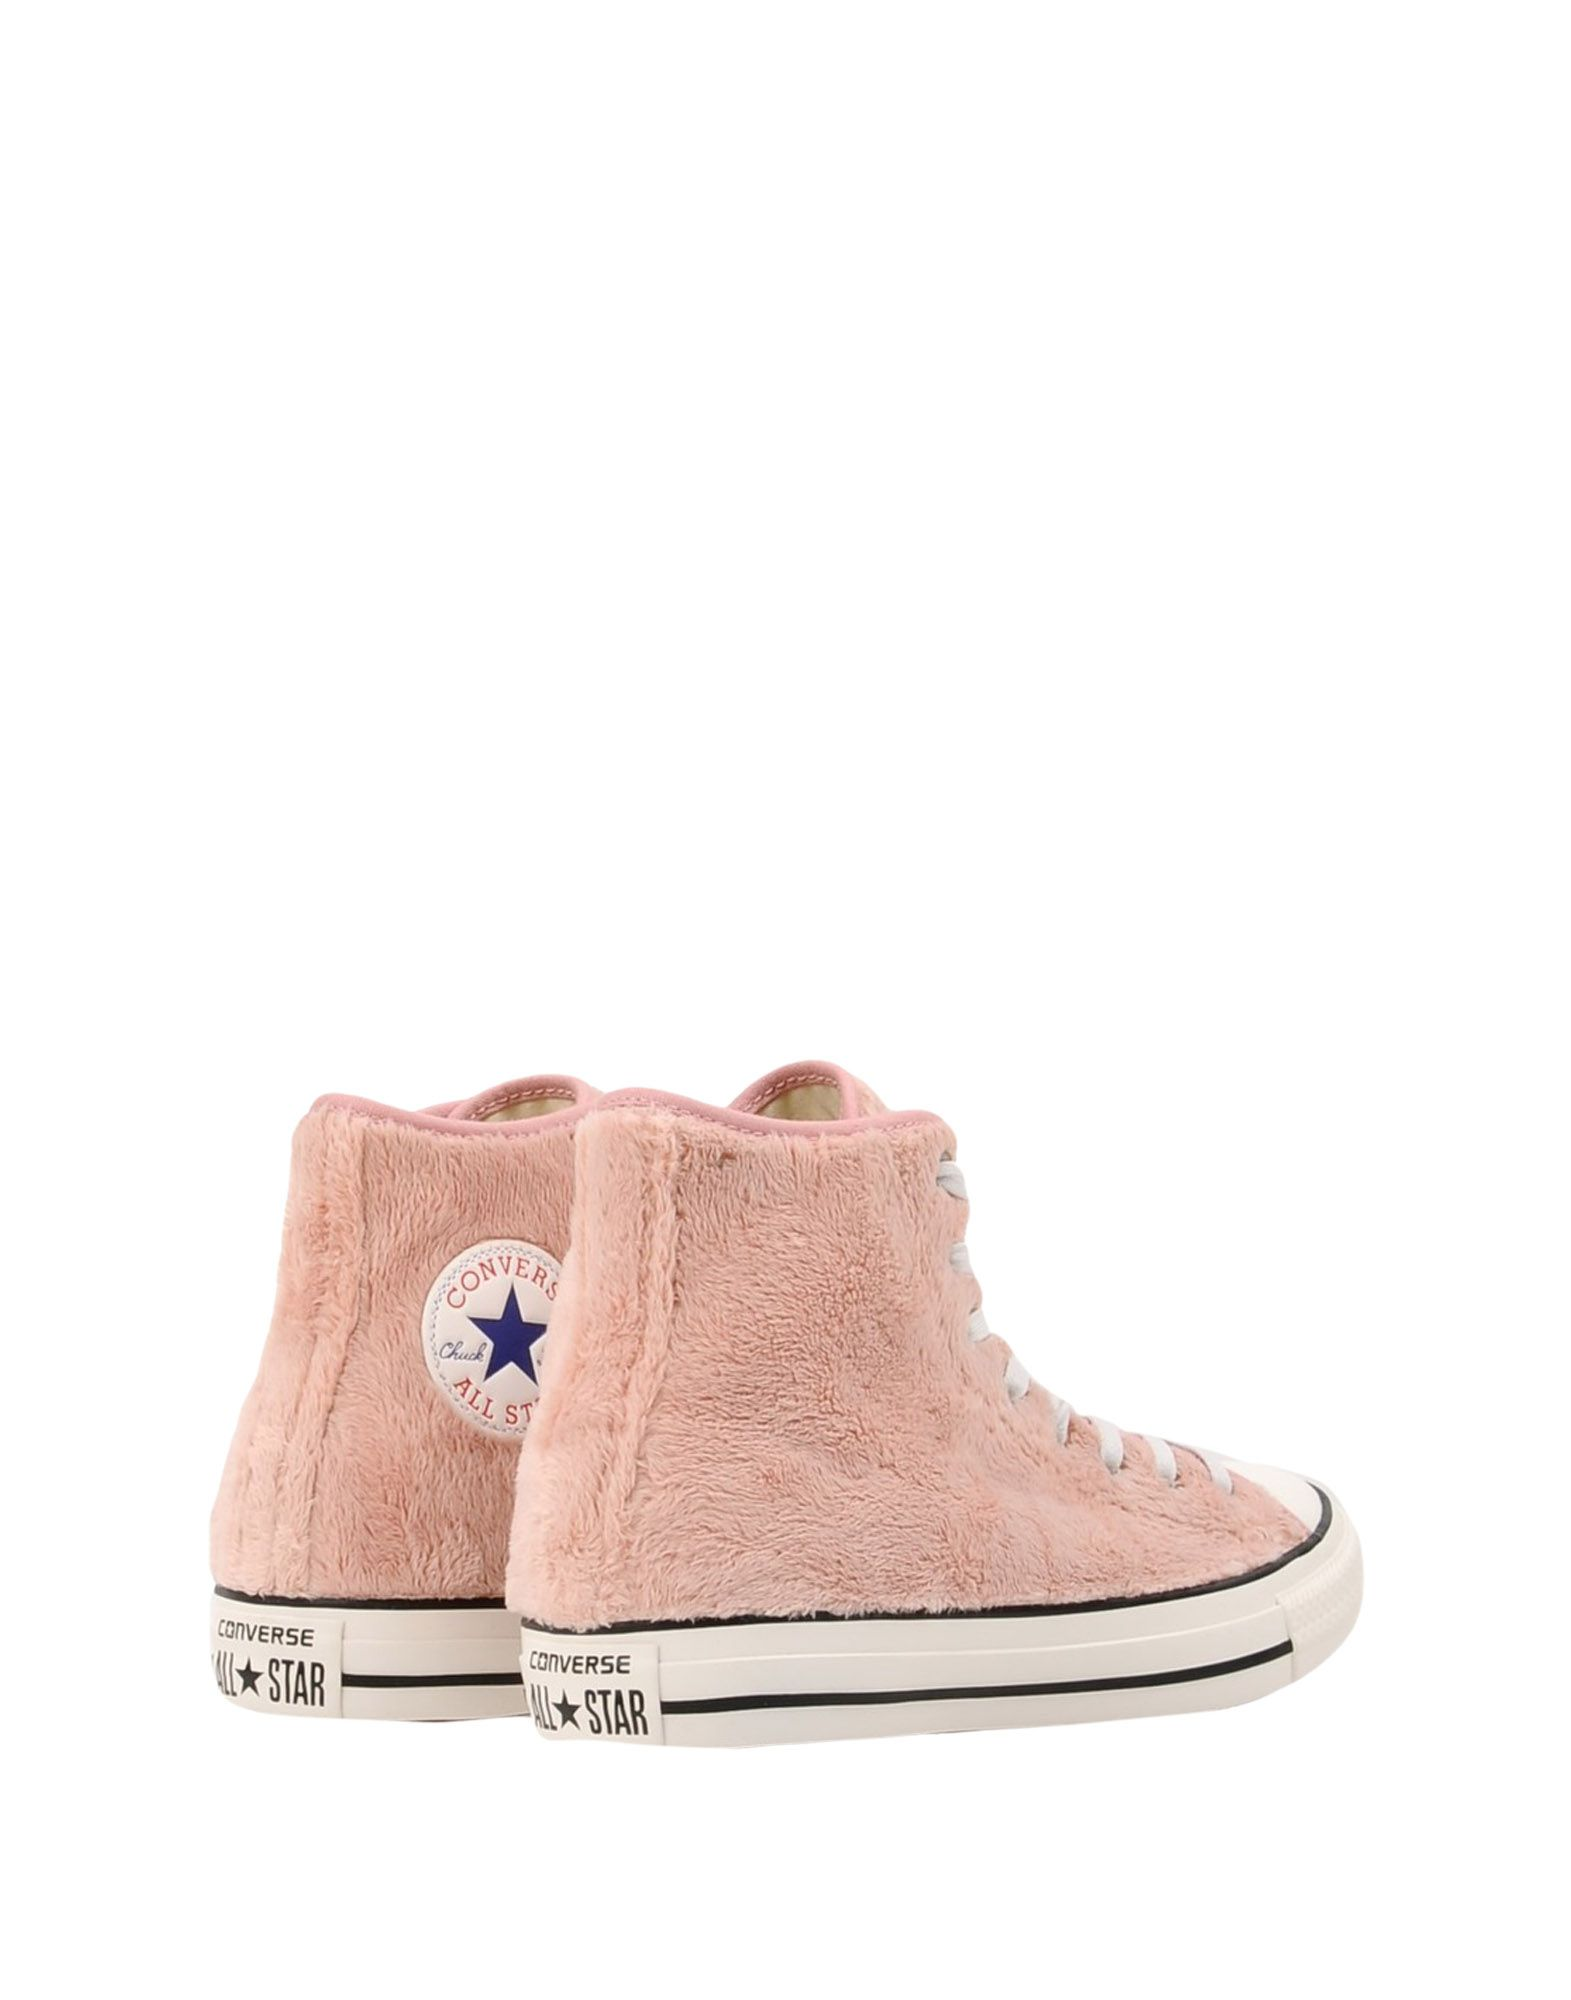 Converse Hi All Star Ct As Hi Converse Faux Fur  11385325HL Gute Qualität beliebte Schuhe 91ddea